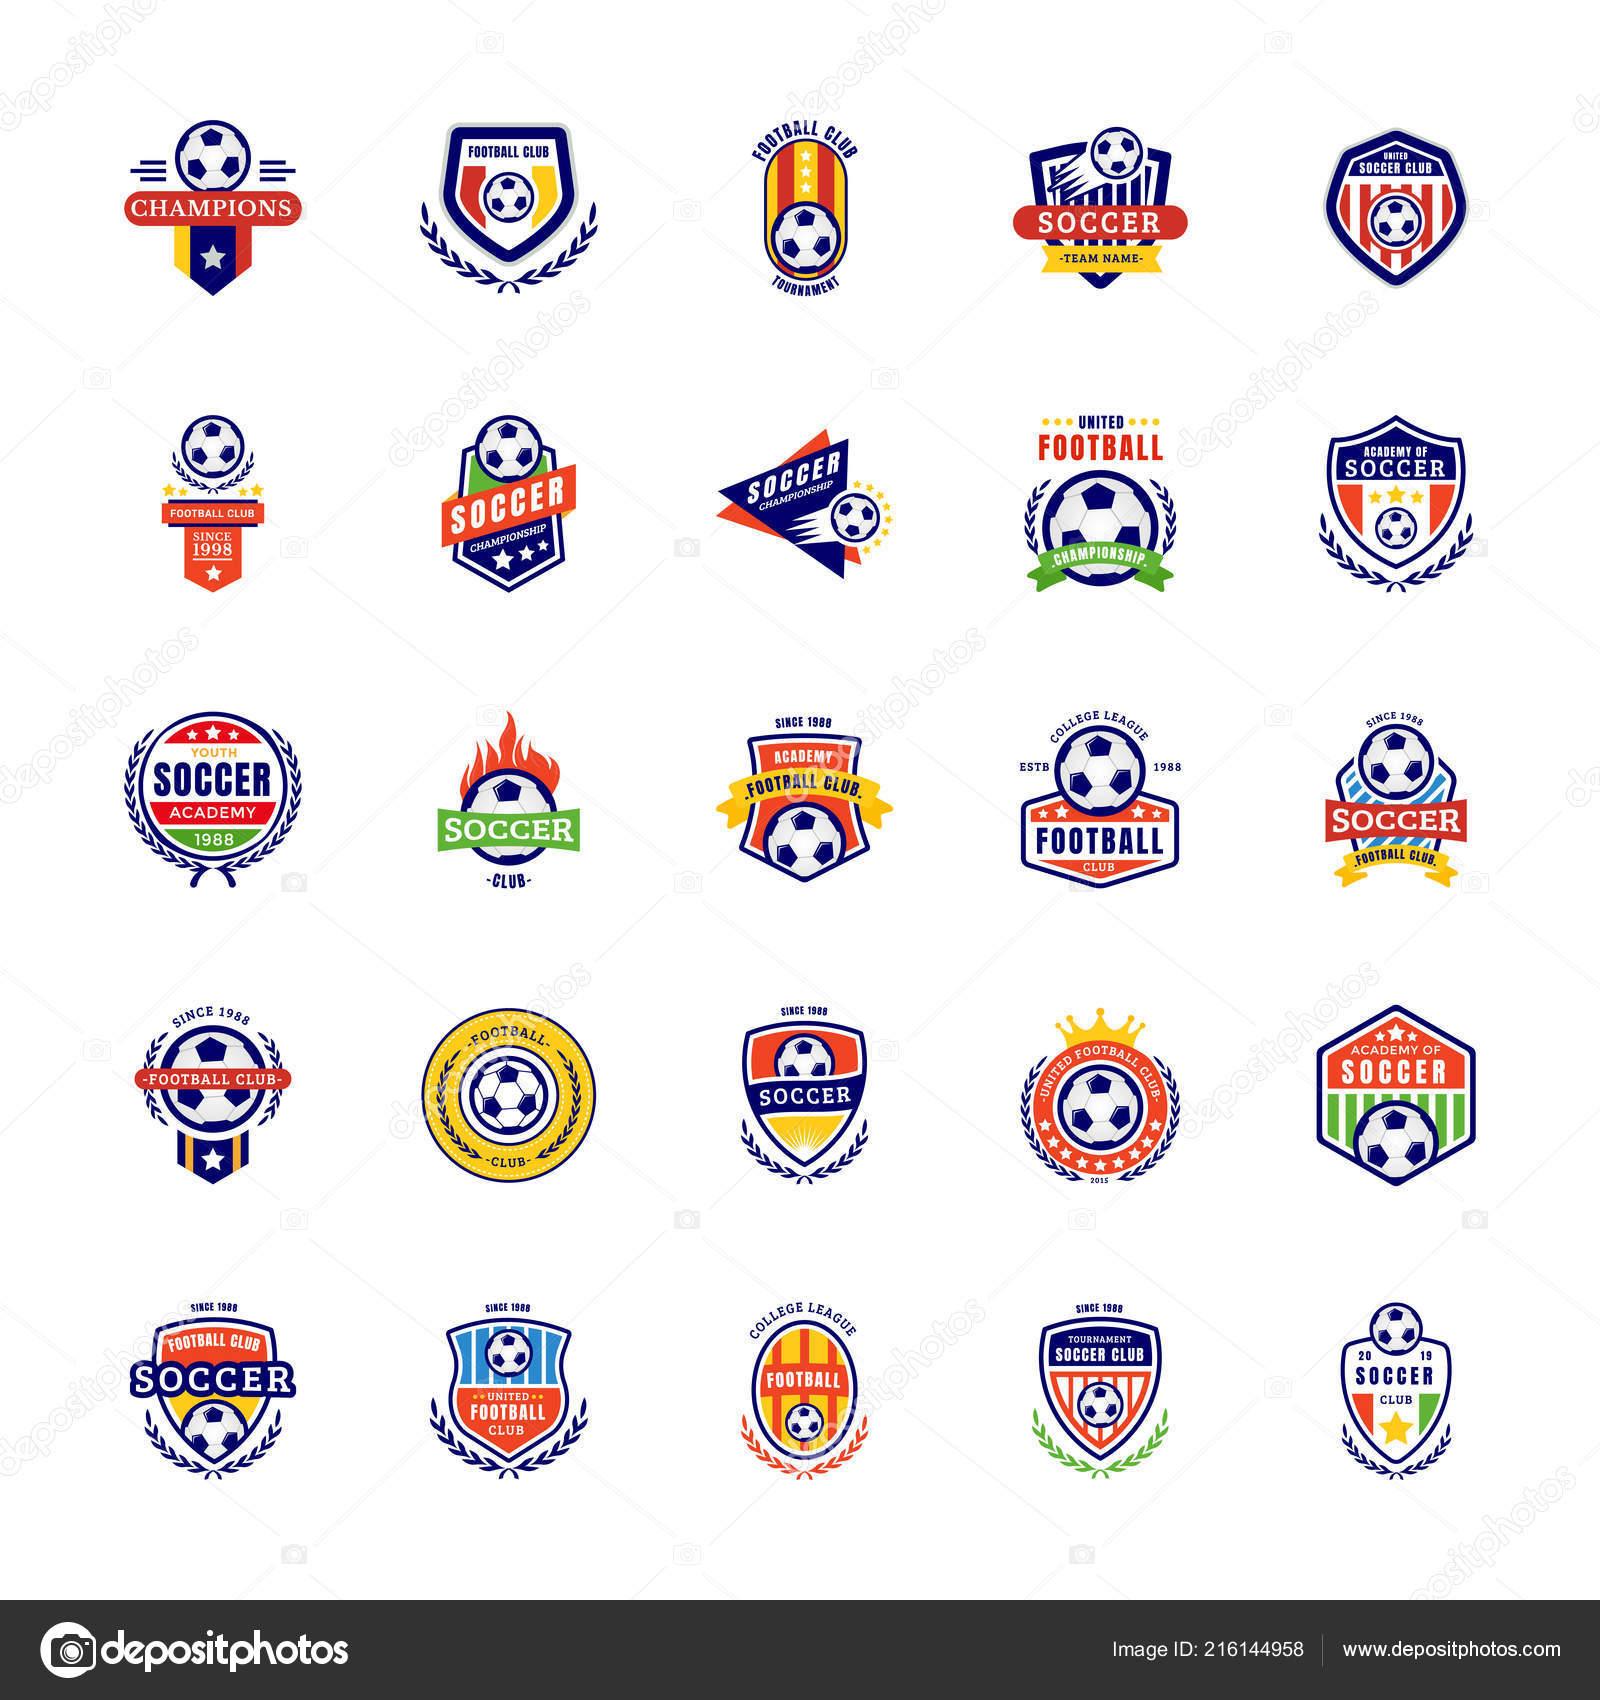 Fussball Abzeichen Logo Icons Stockvektor C Vectorsmarket